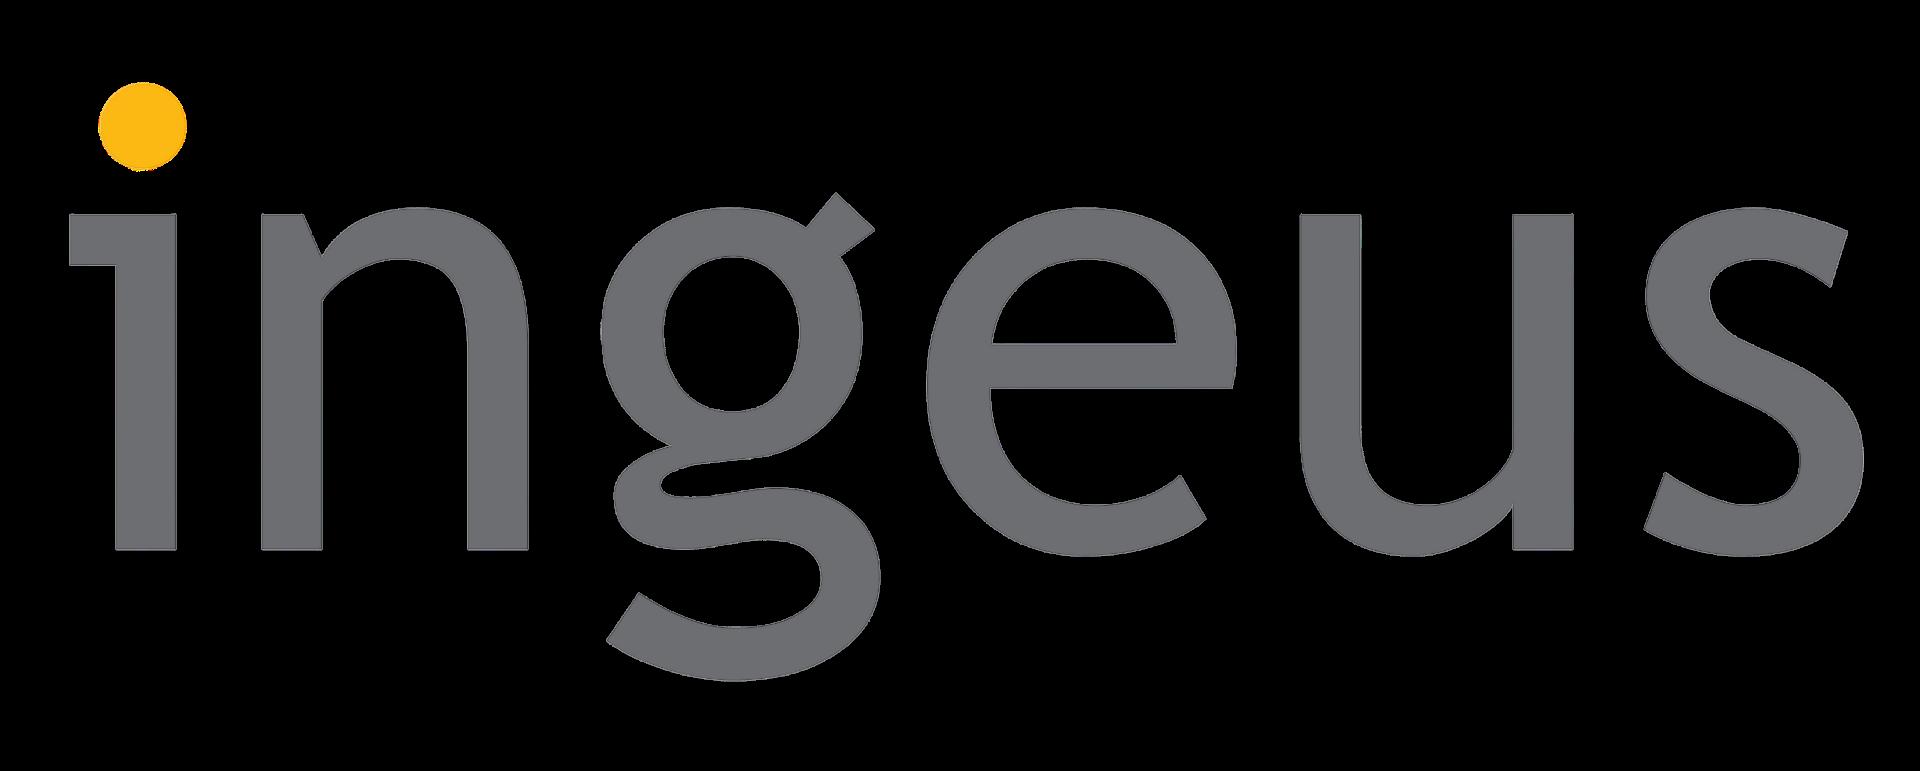 Igeneus logo